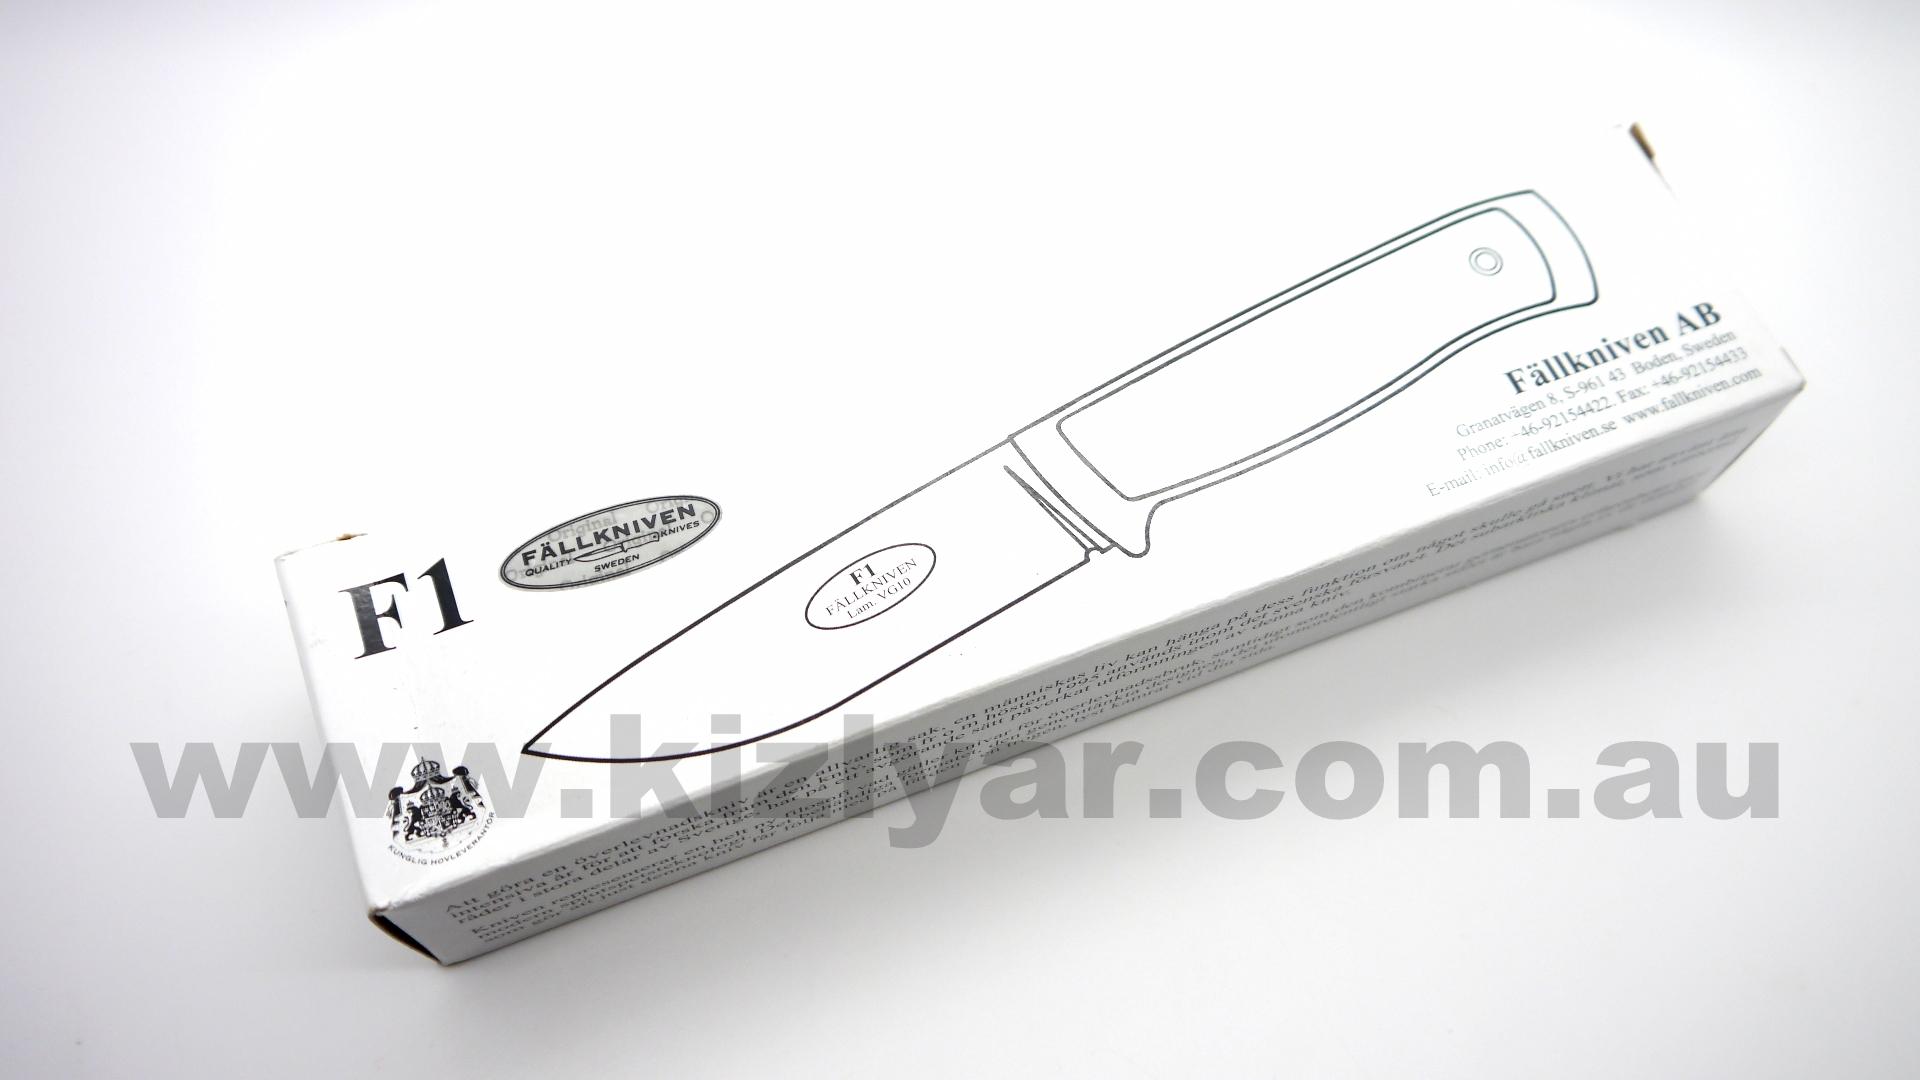 Fallkniven F1z3G Military Fixed Blade Knife - $370 00 Kizlyar Knives